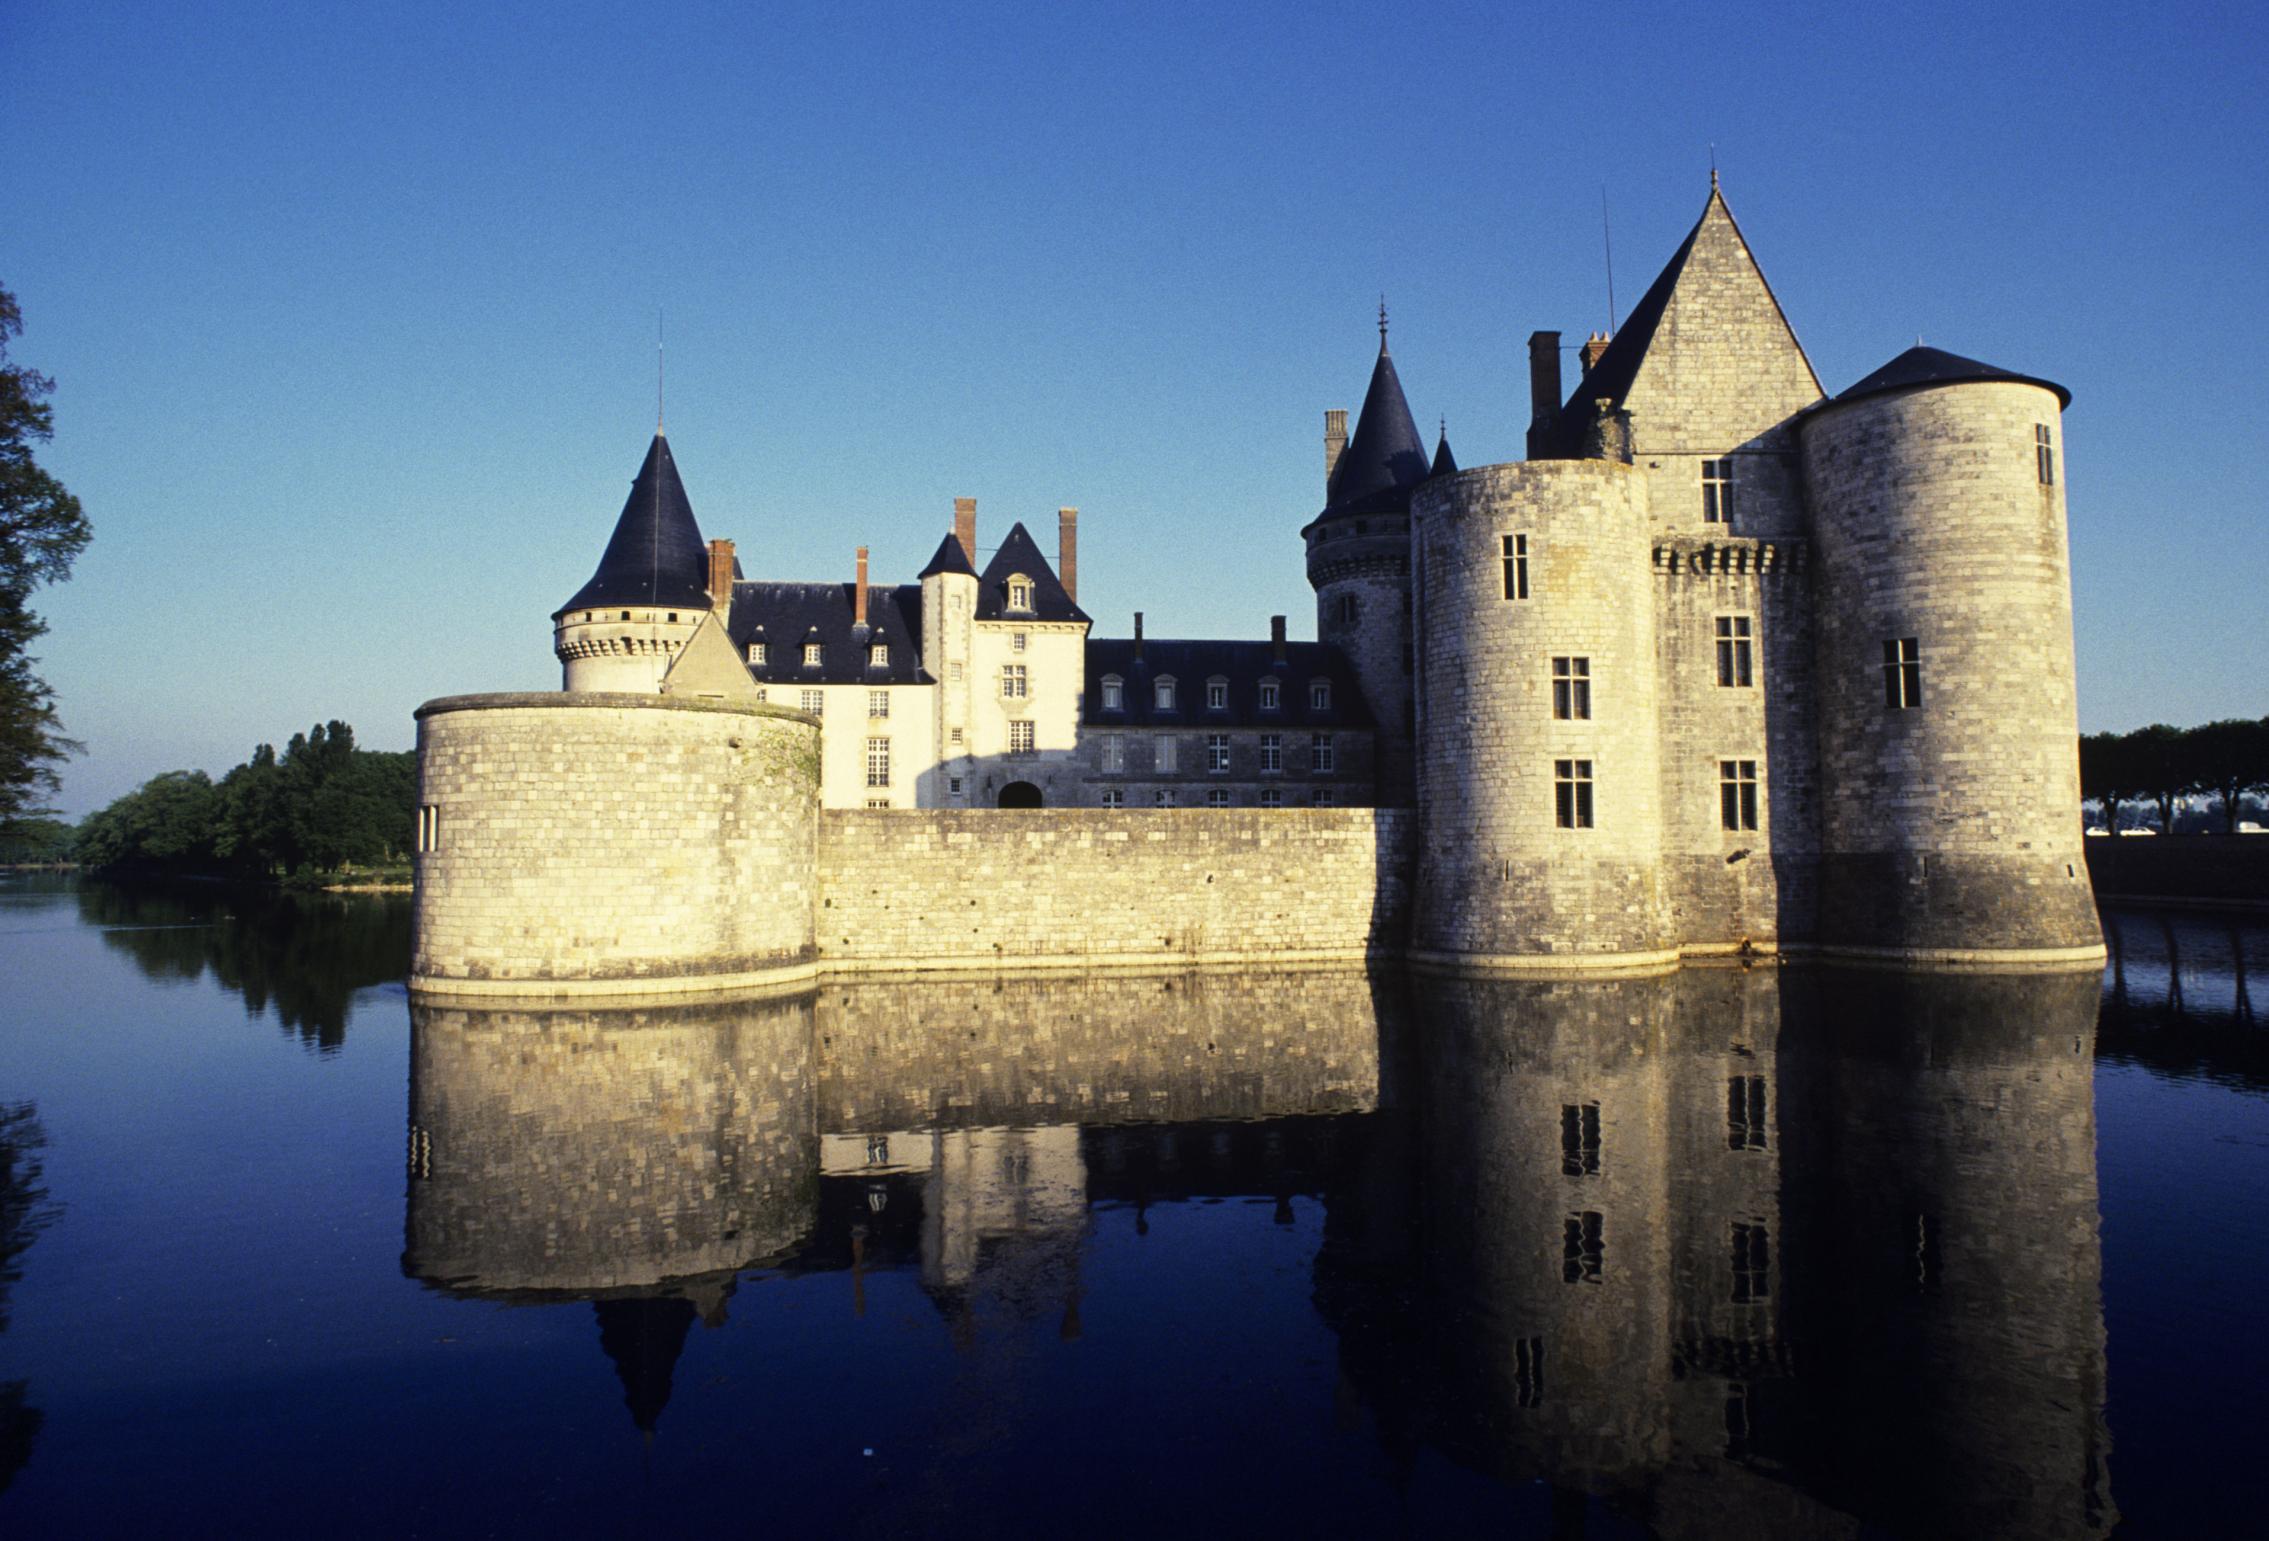 Chateau Sully-sur-Loire, Loire valley, France